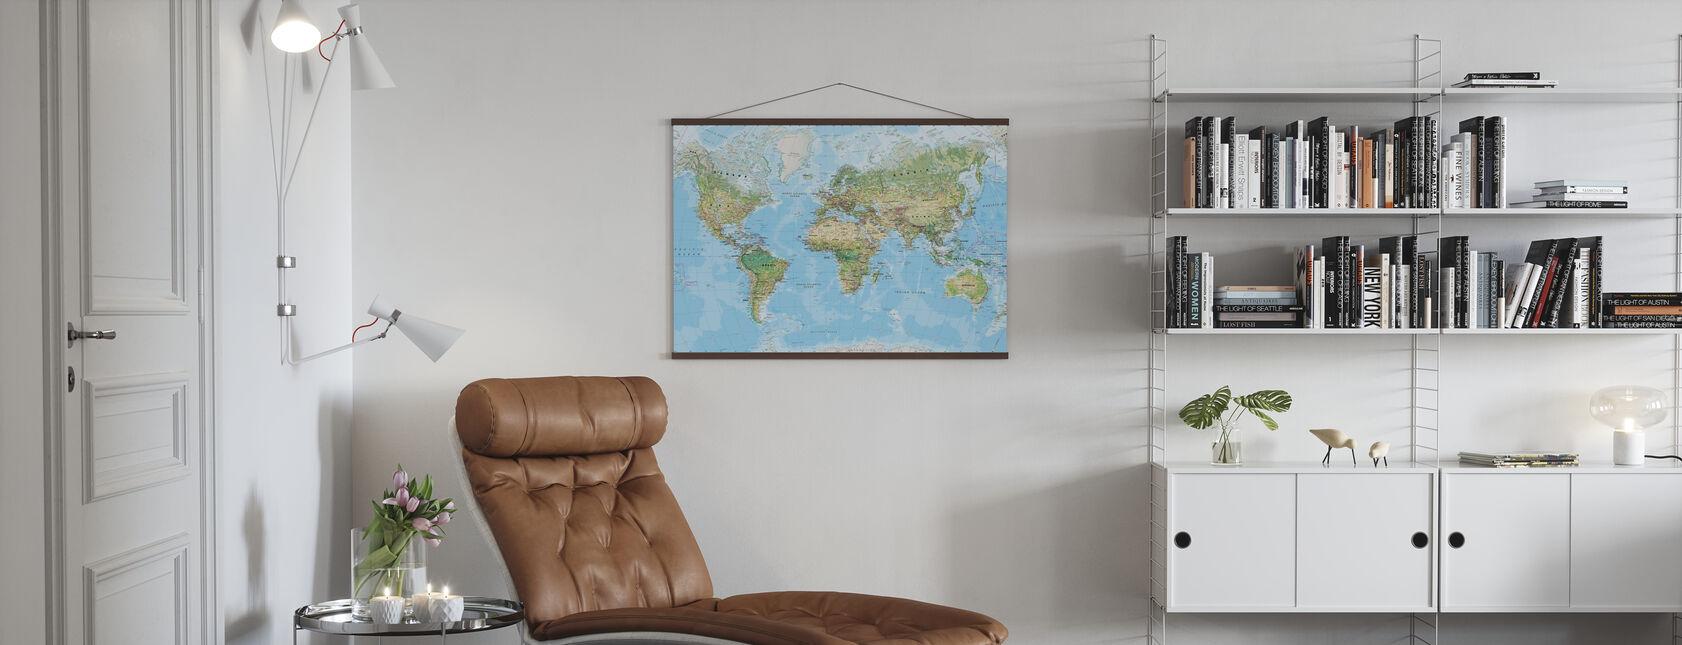 Verdenskort - Plakat - Stue